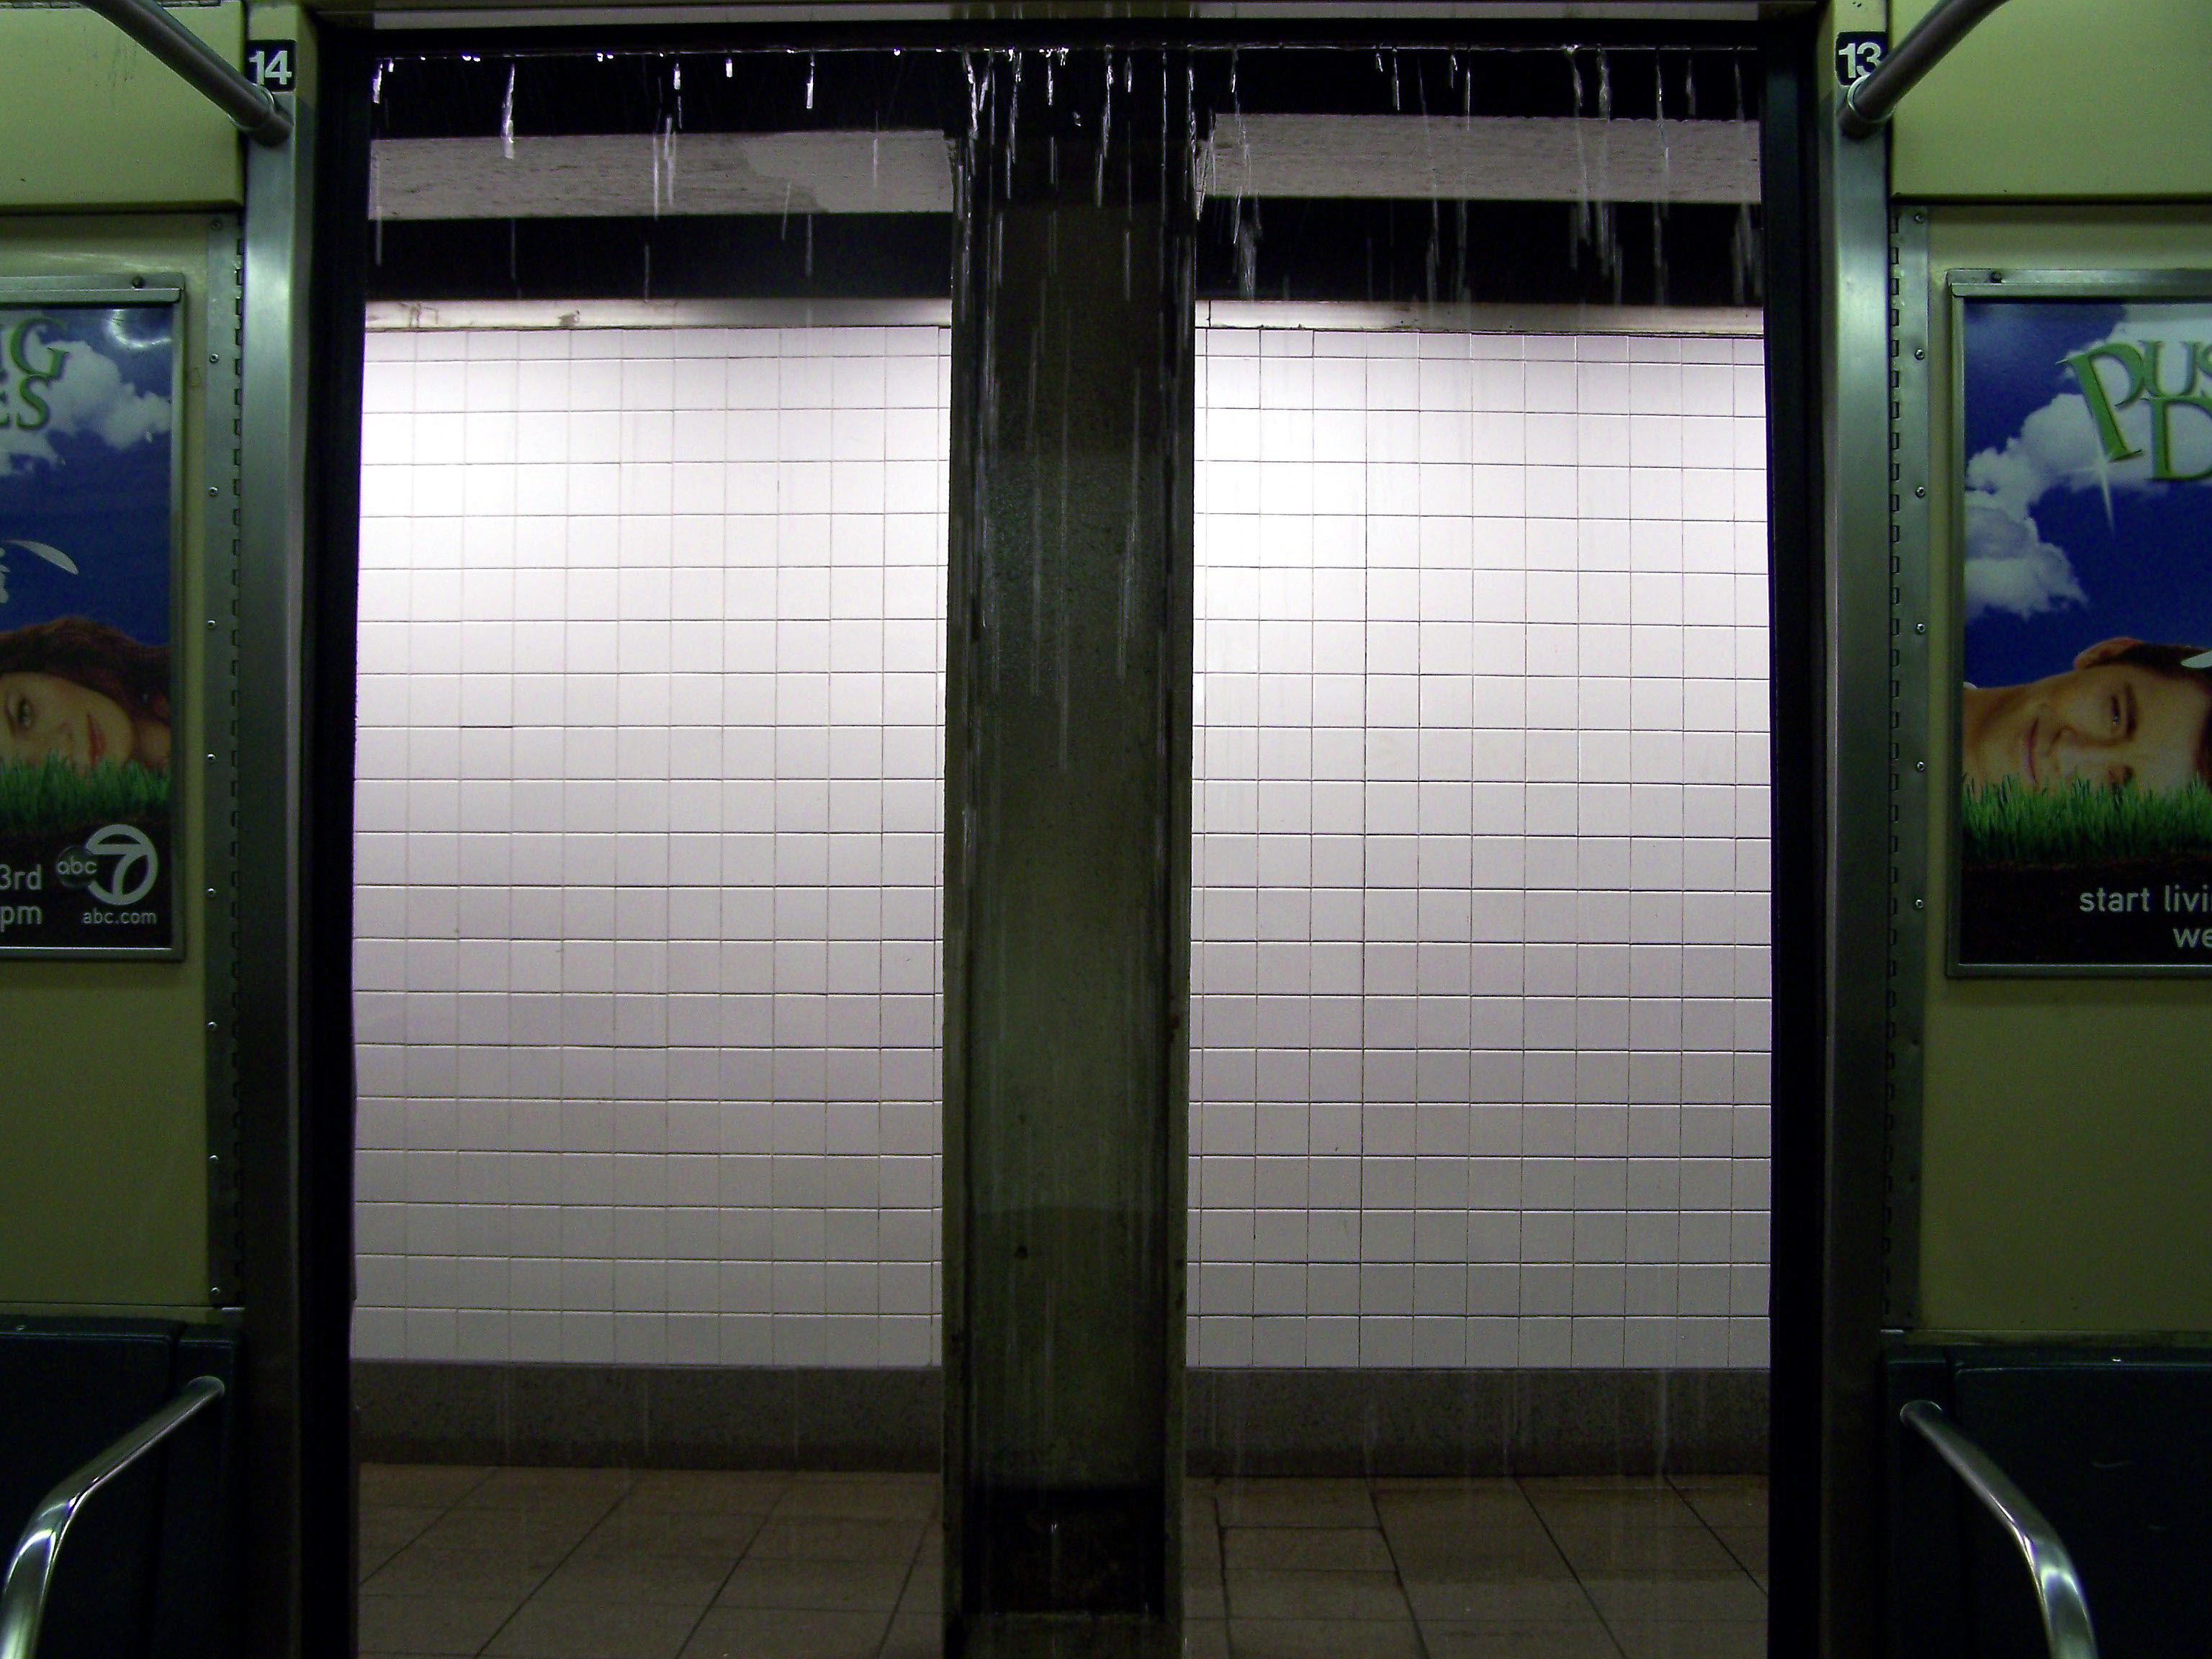 Subway in new york city trip planner houston